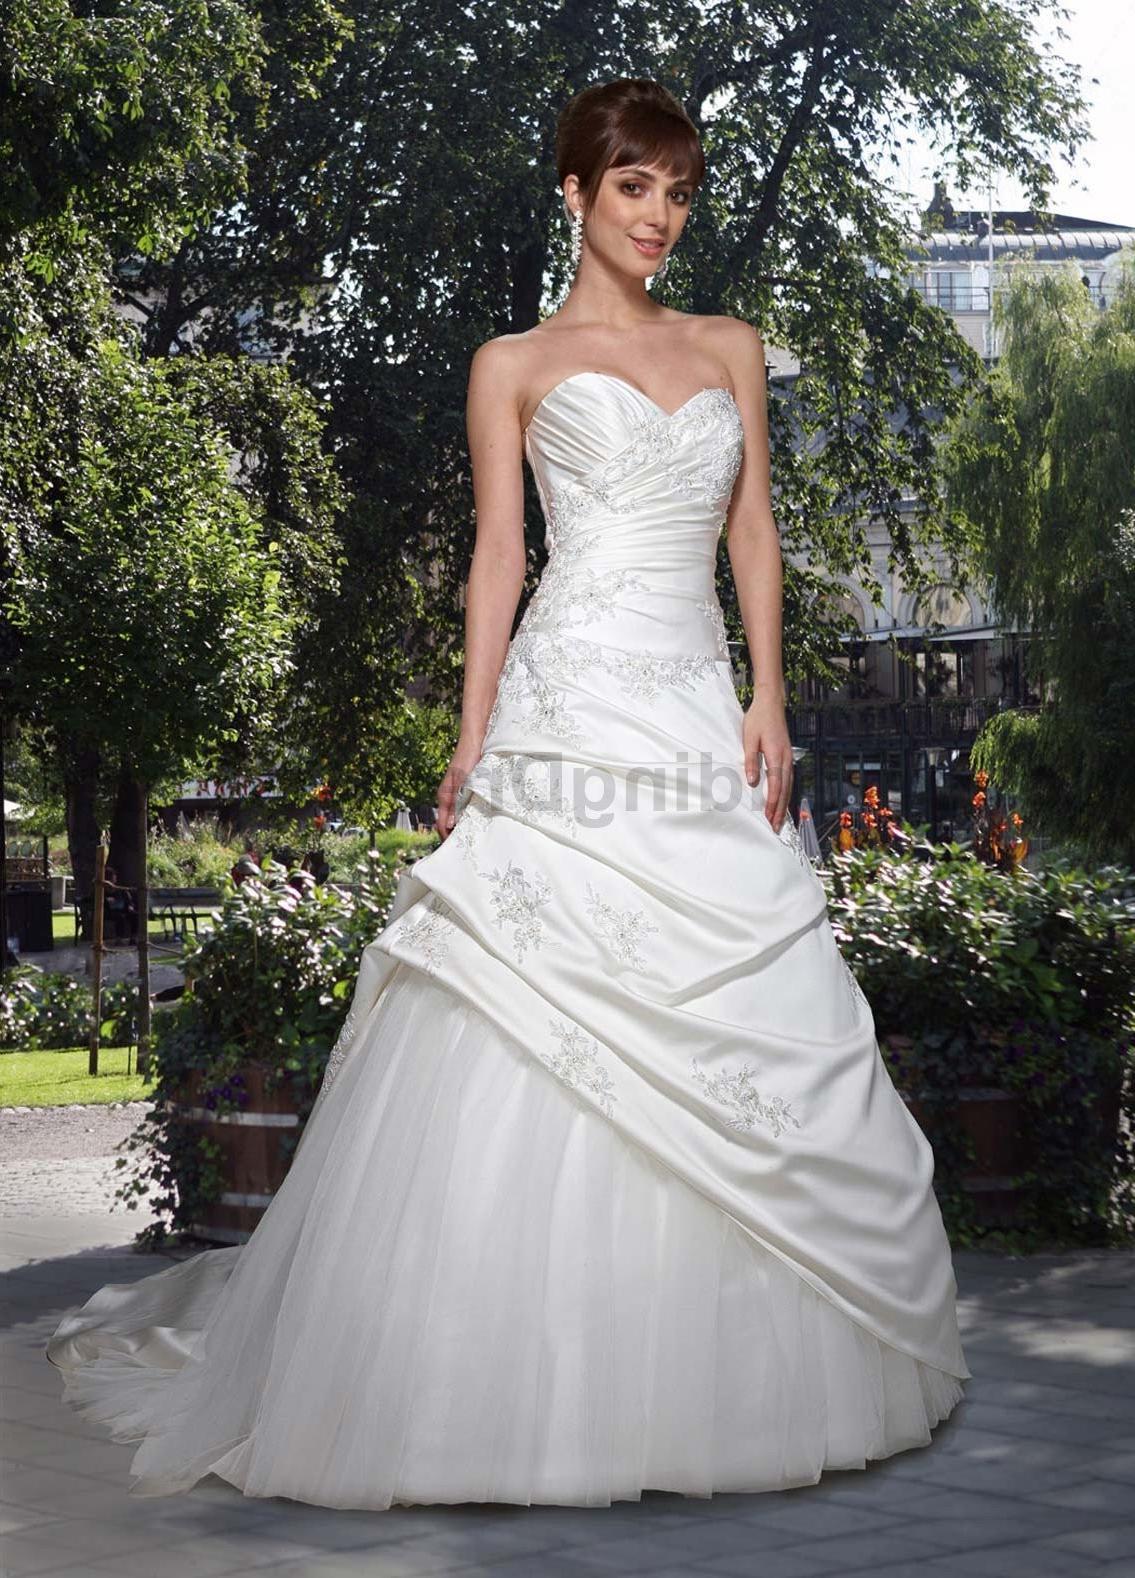 Dress. Satin A-Line